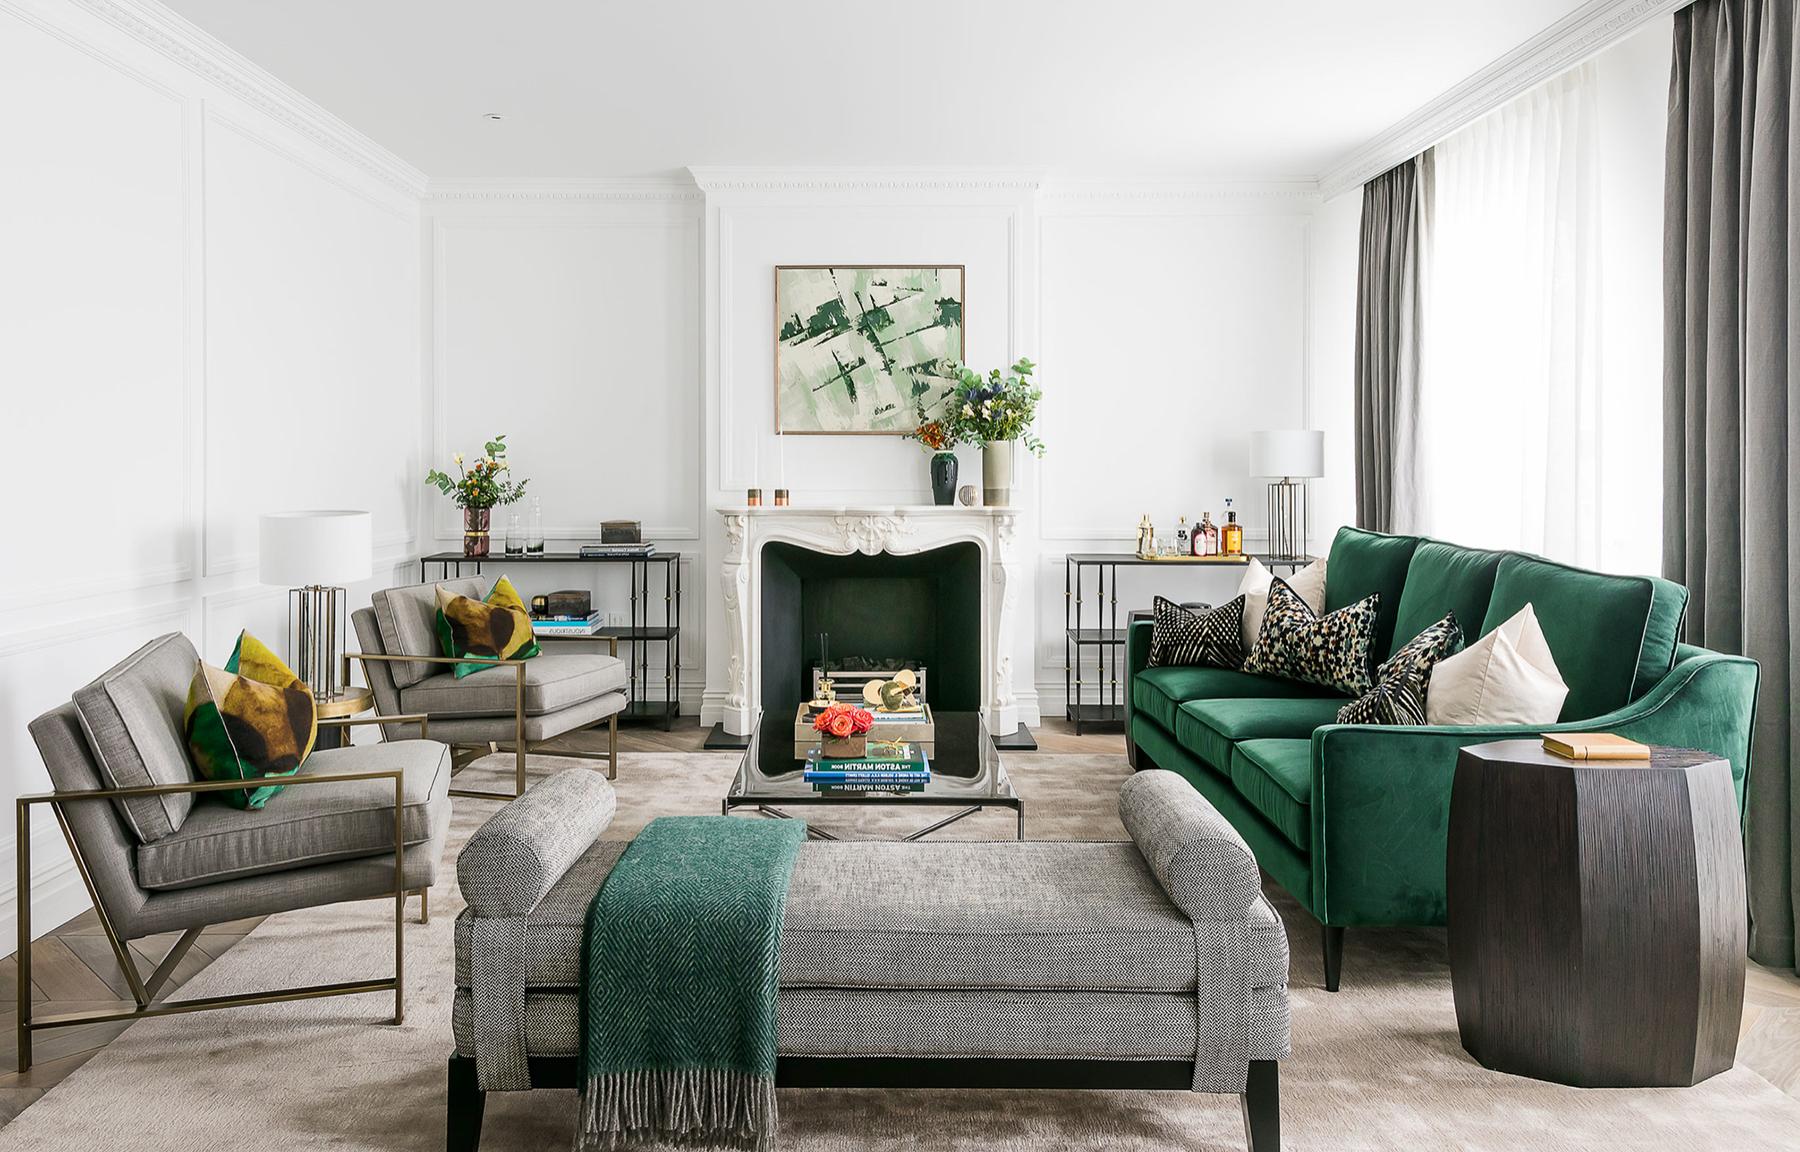 Beautiful Art Deco Style Green Living Room Decor With Green Velvet Transitional Sofa Green Sofa Living Green Sofa Living Room Green Living Room Decor